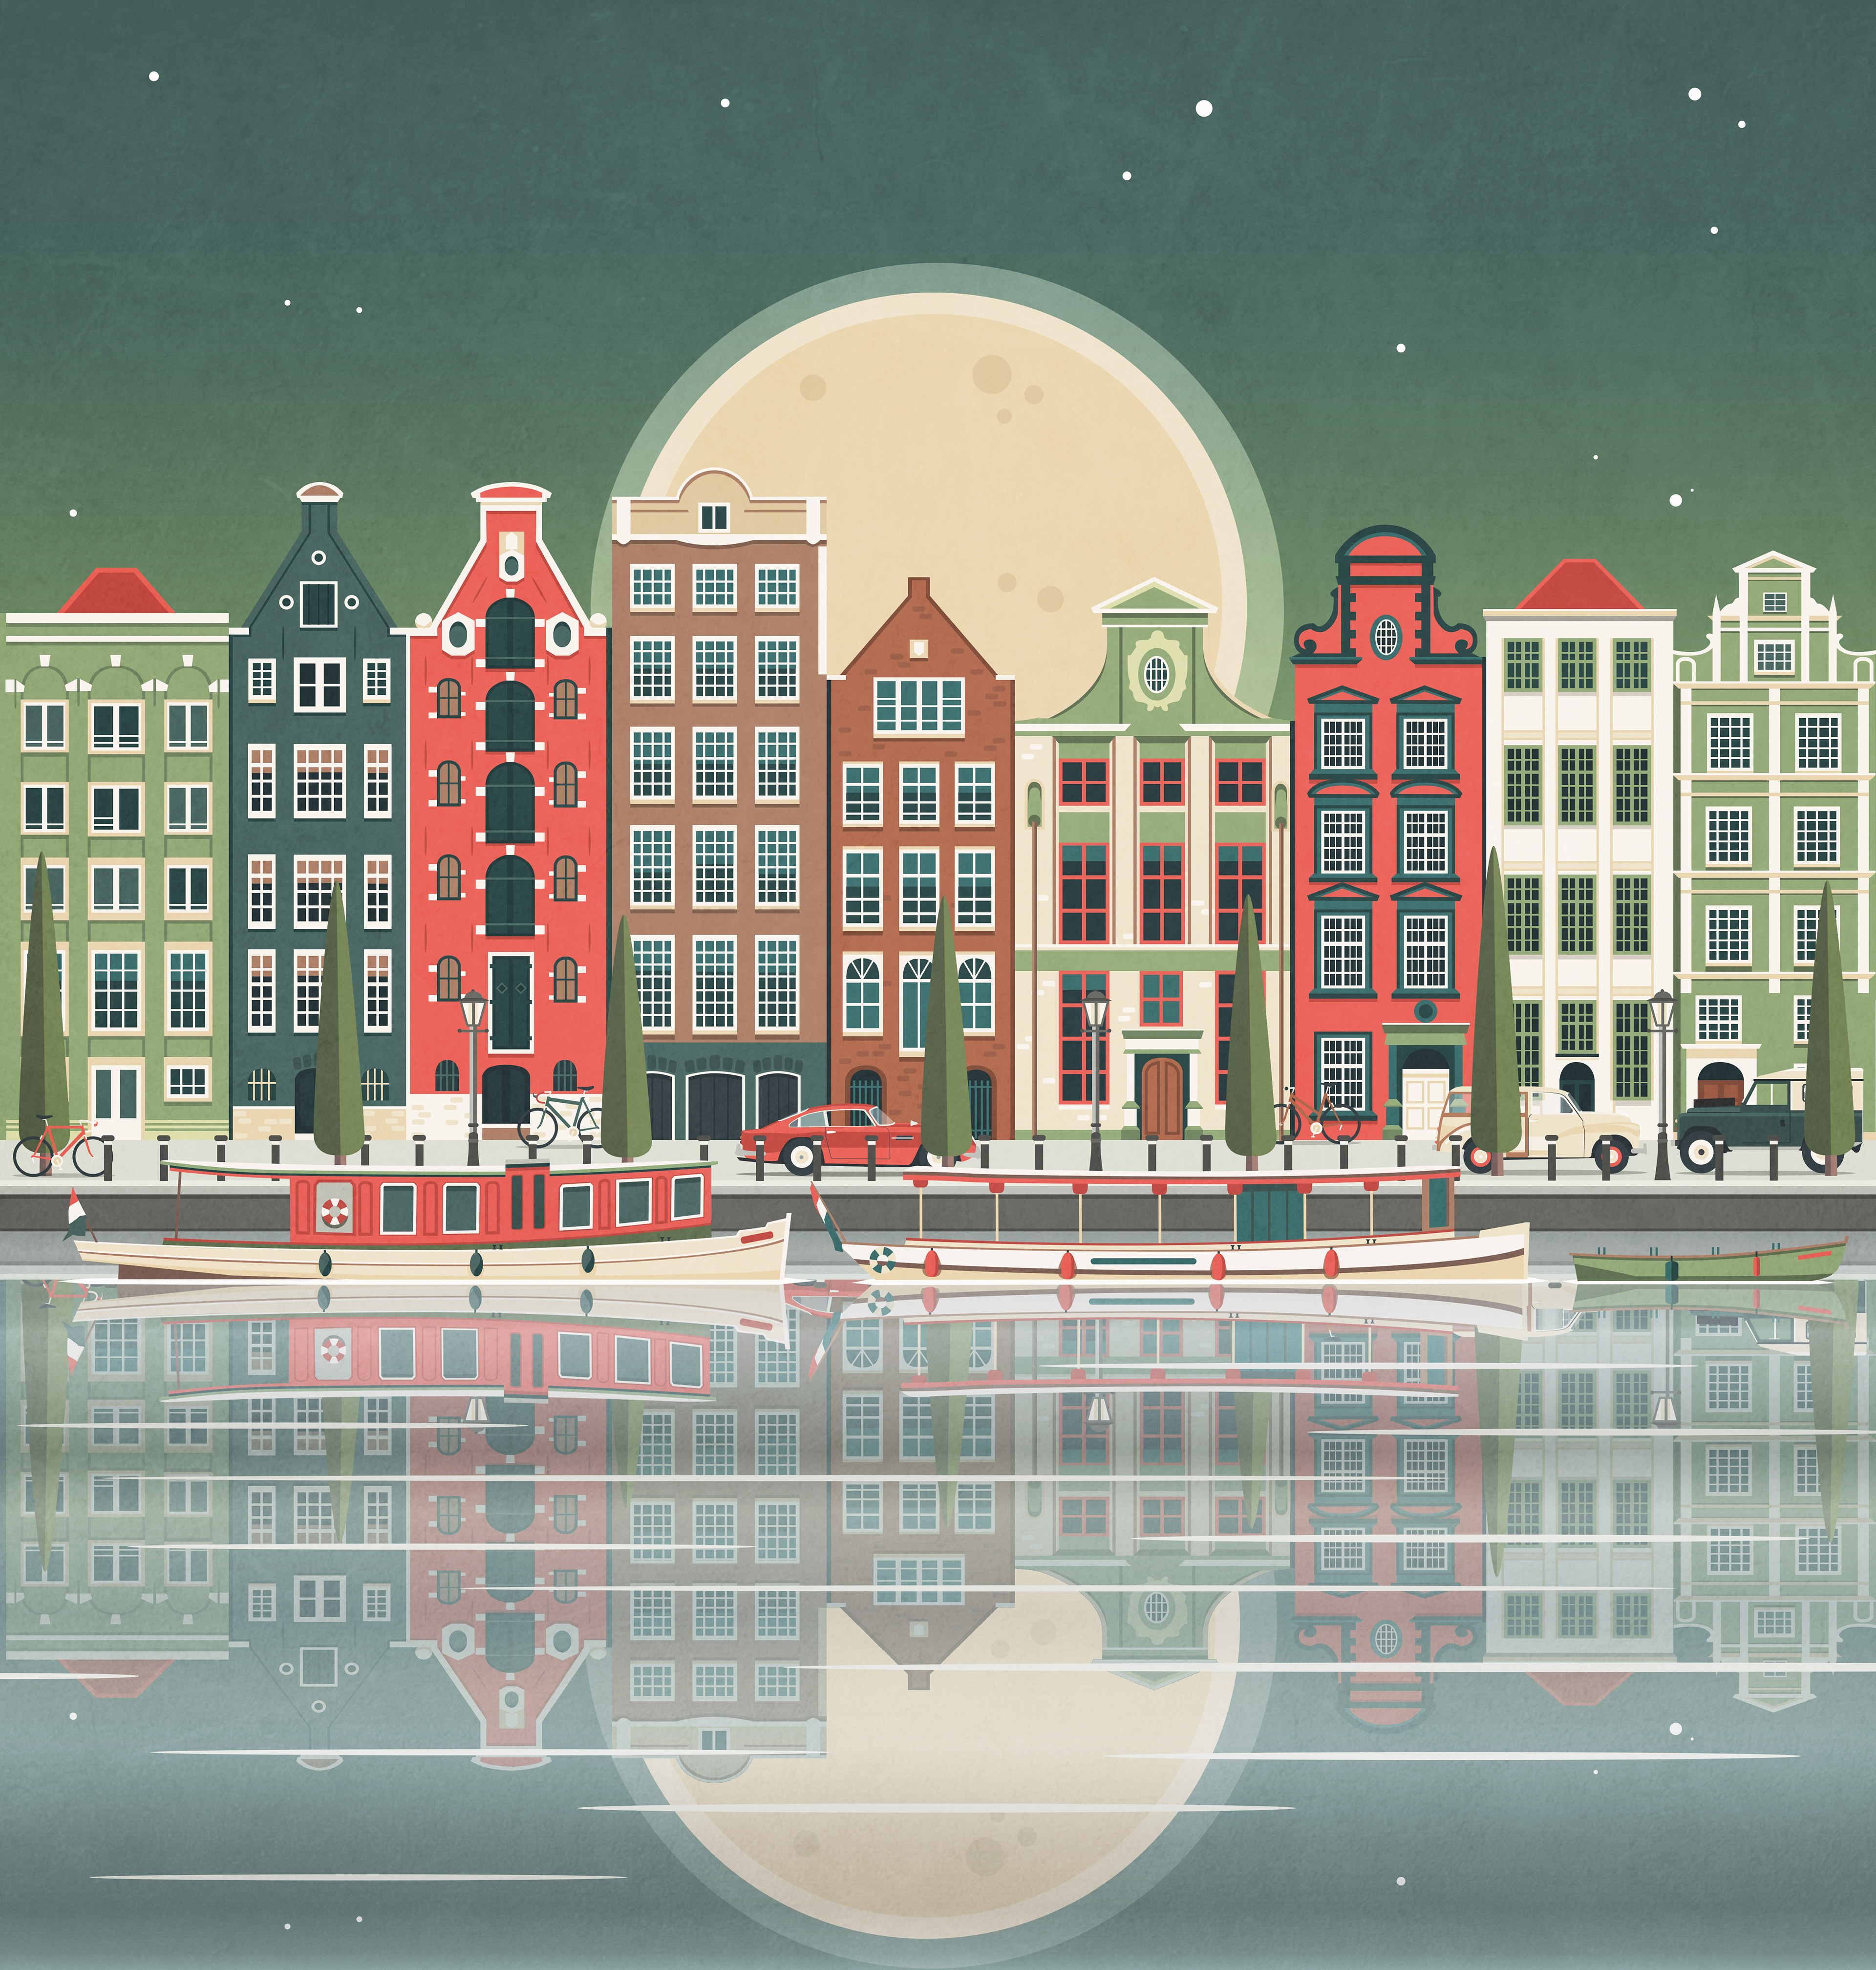 Amsterdam on